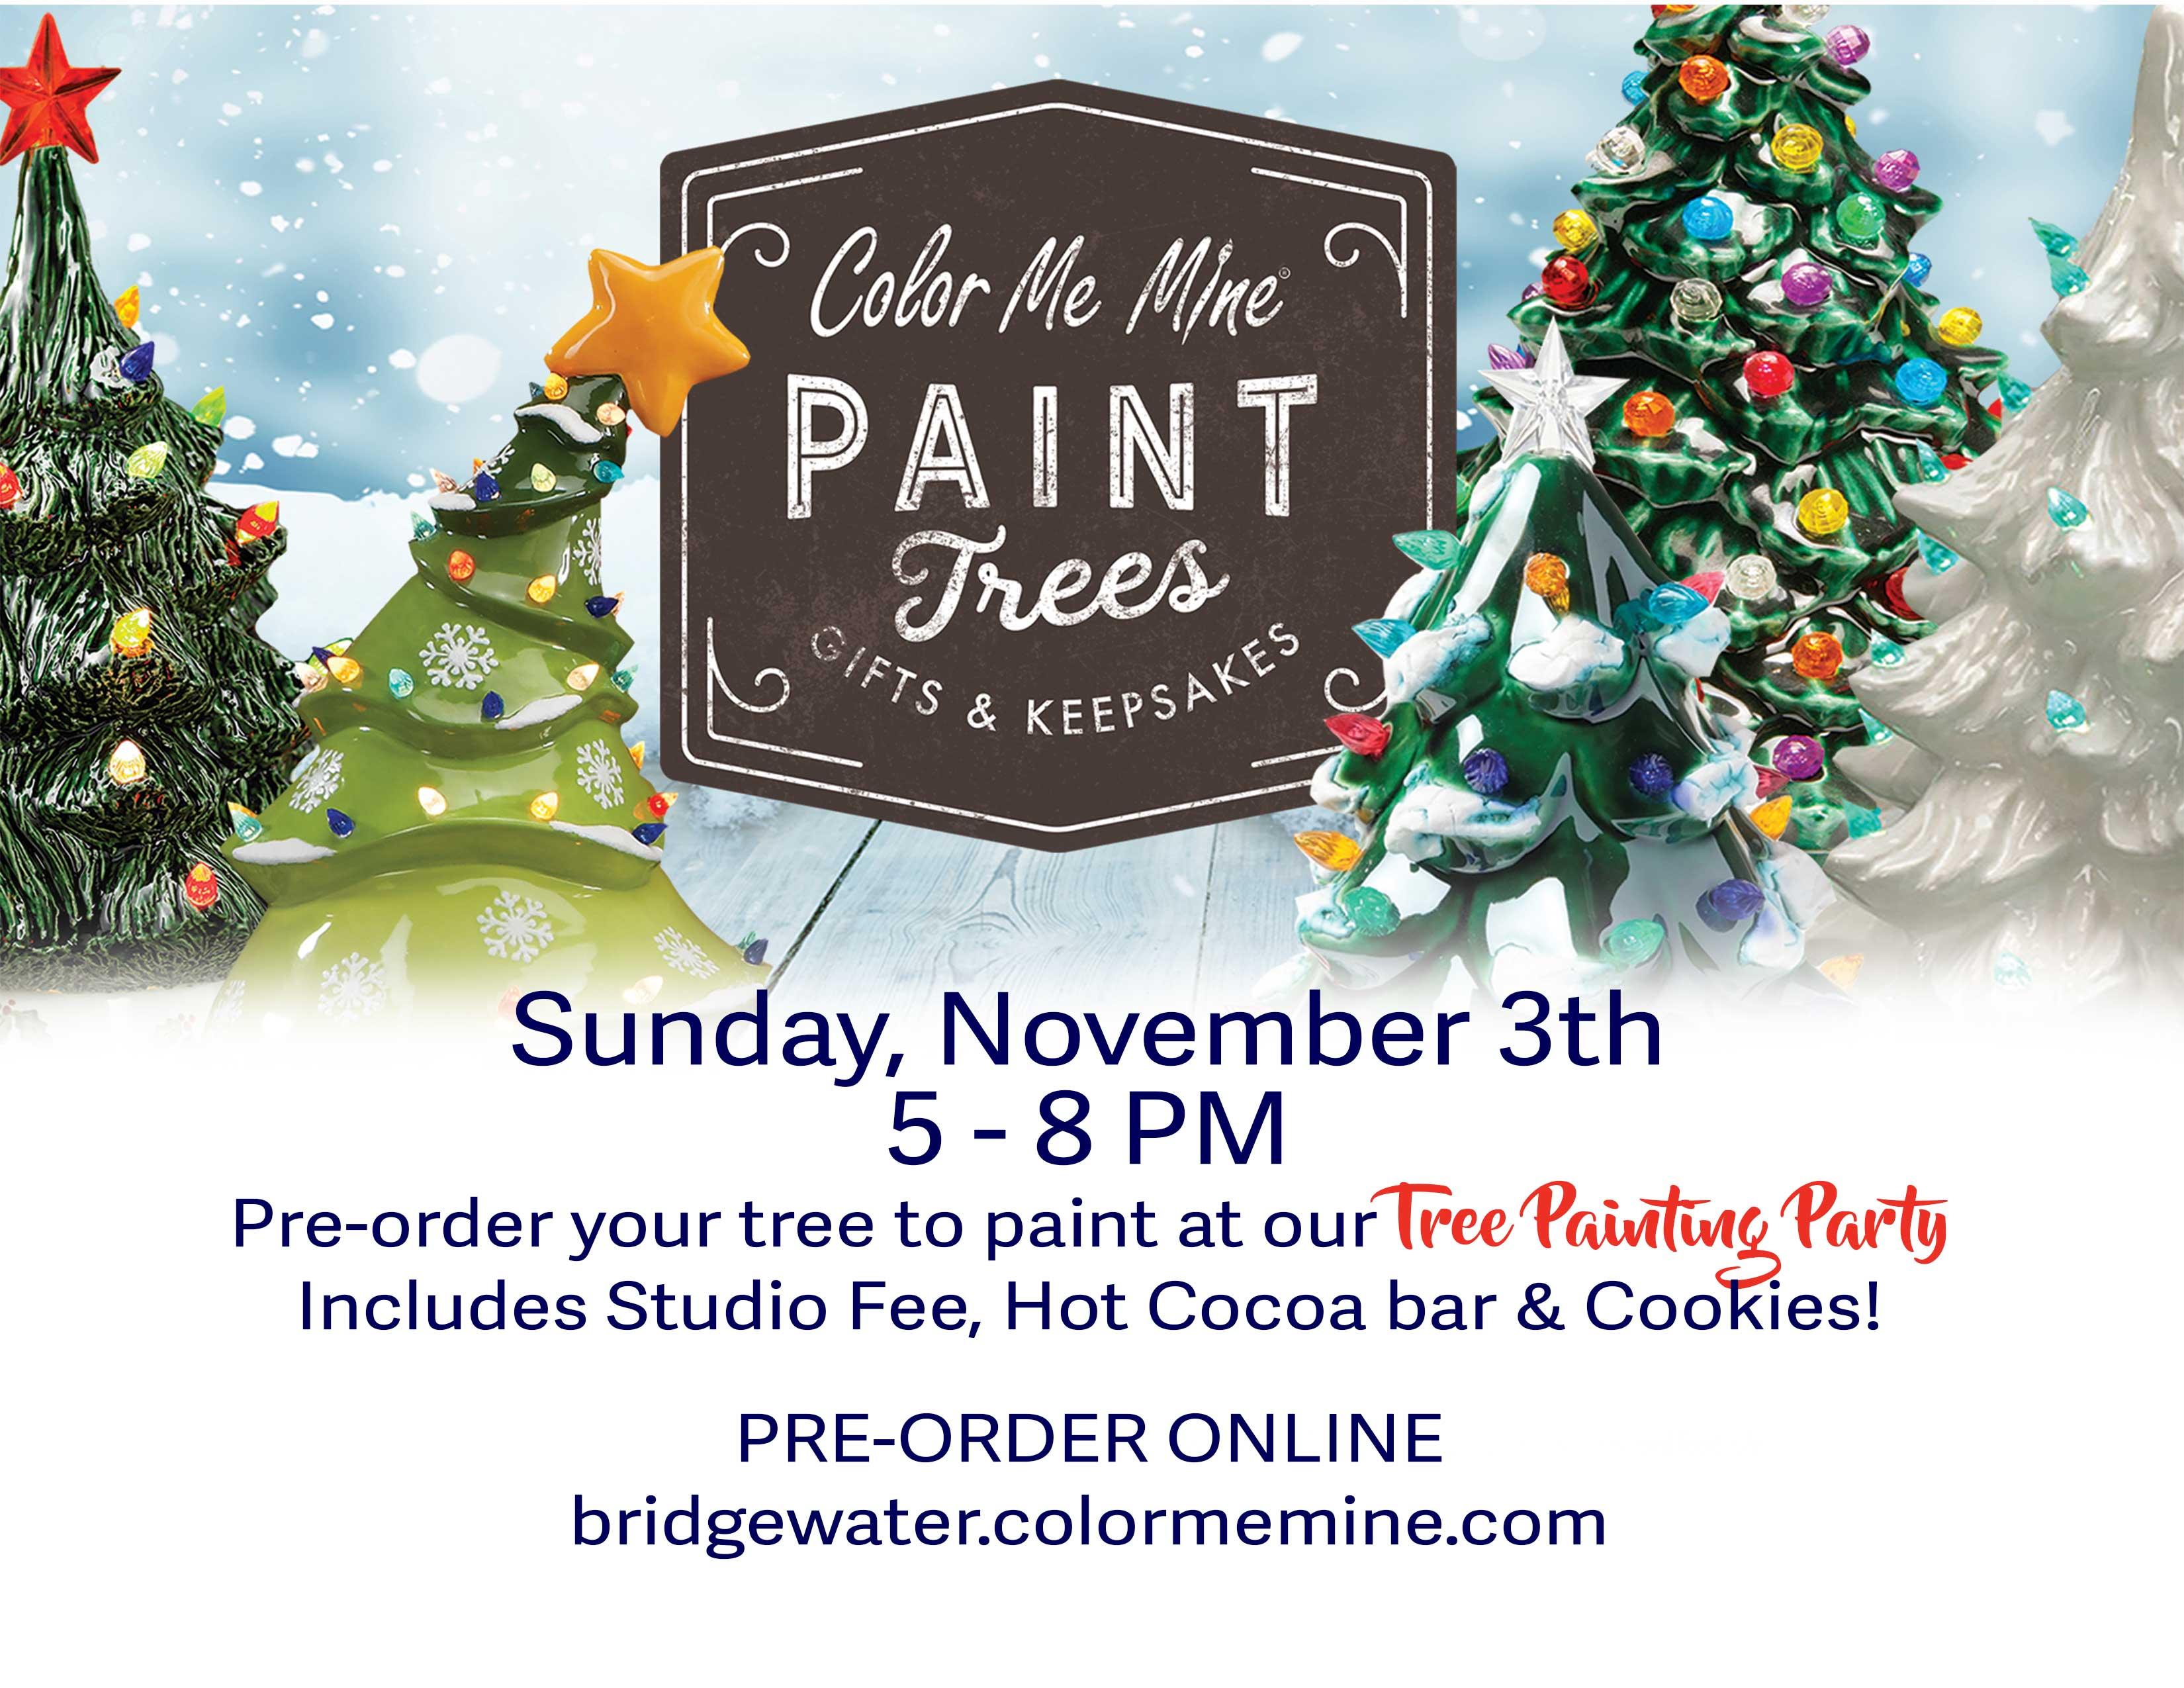 Christmas Tree Near Me.Christmas Tree Painting Party At Color Me Mine Bridgewater